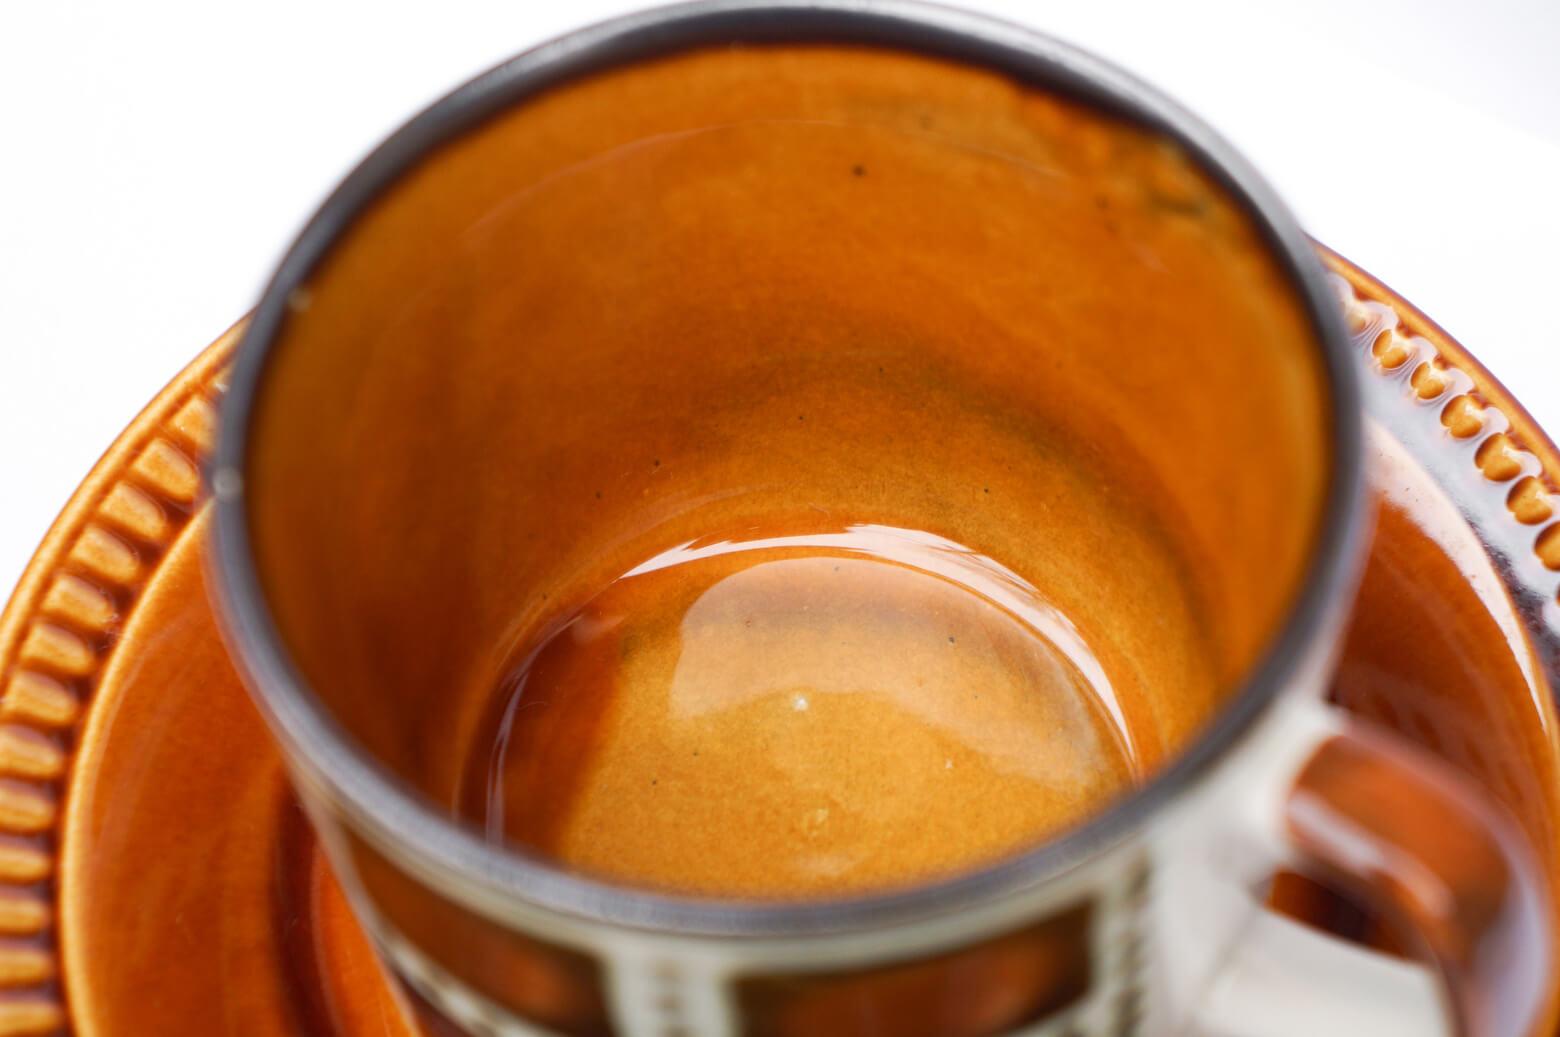 Boch Cup and Saucer Bernadette / ボッホ カップ アンド ソーサー ベルナデッタ ヴィンテージ 食器 ベルギー 雑貨 1